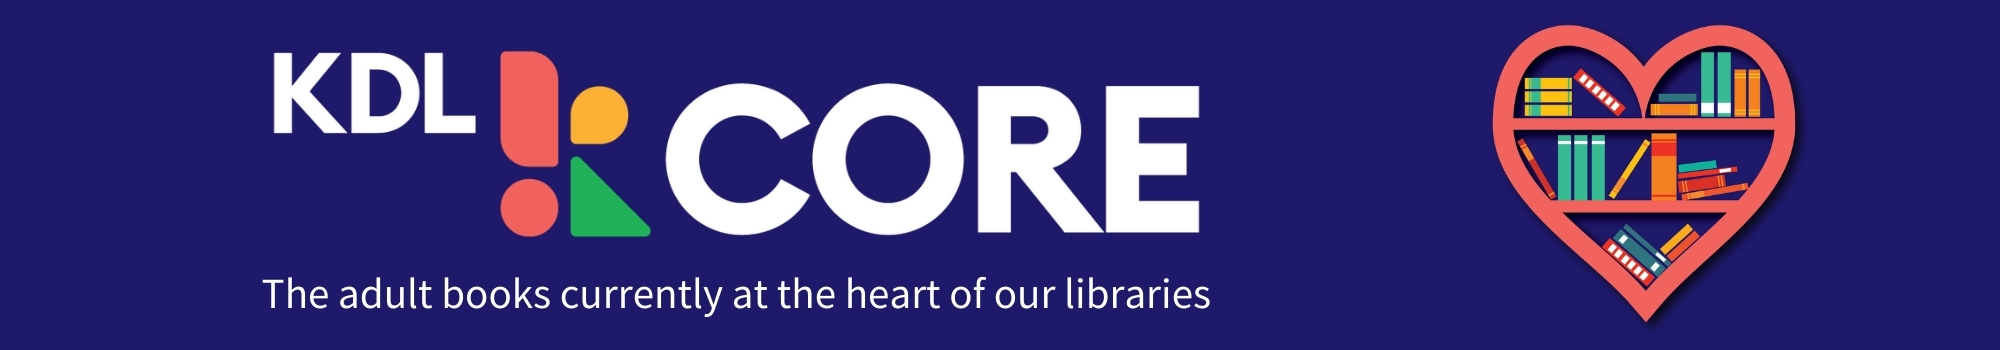 core_header_blue